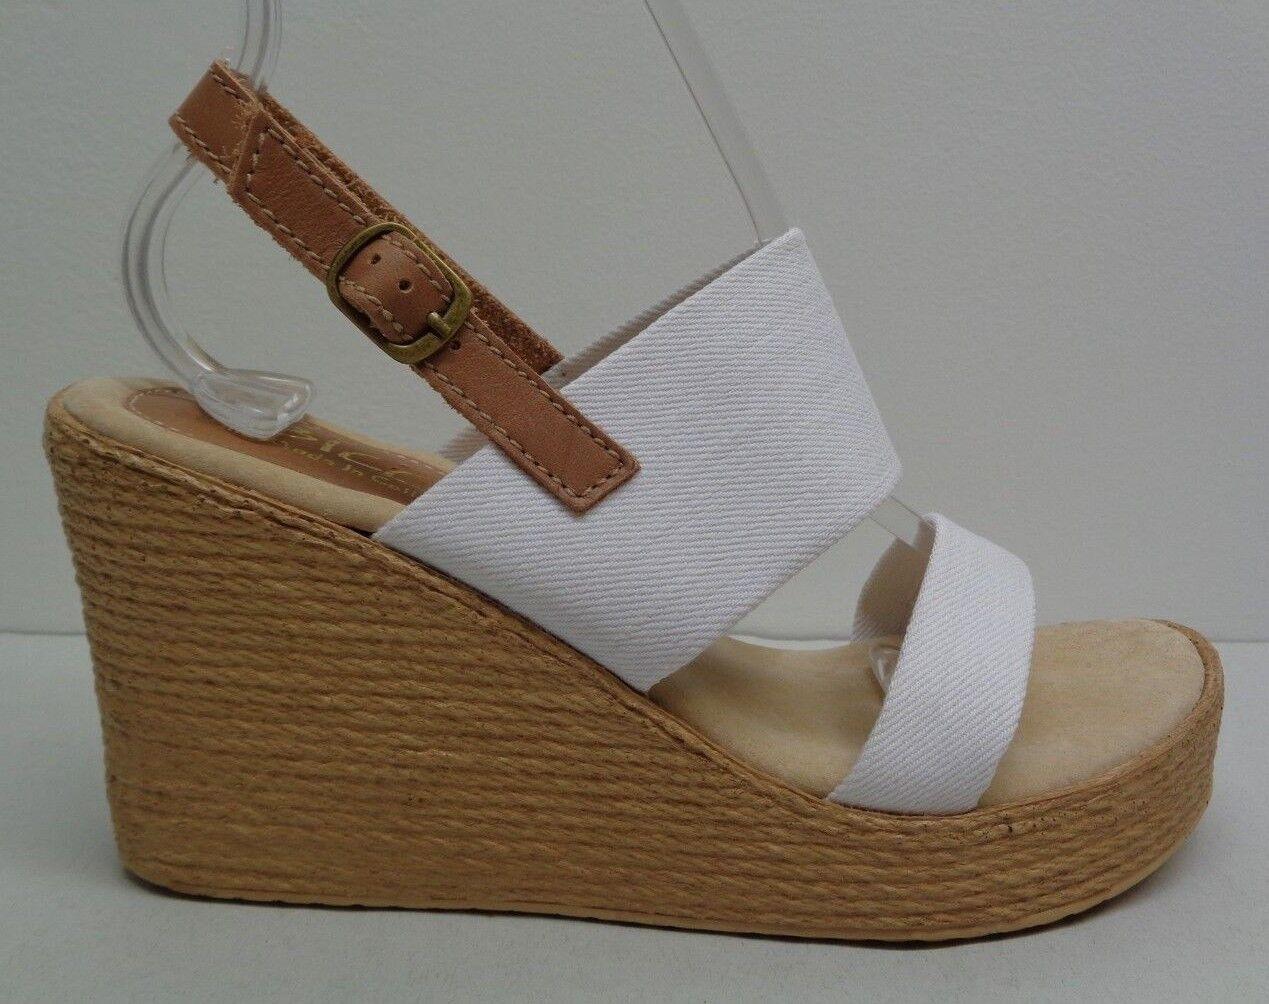 Sbicca Größe 8 M WEISS Tan Platform Wedge Heels Sandales NEU Damenschuhe Schuhes